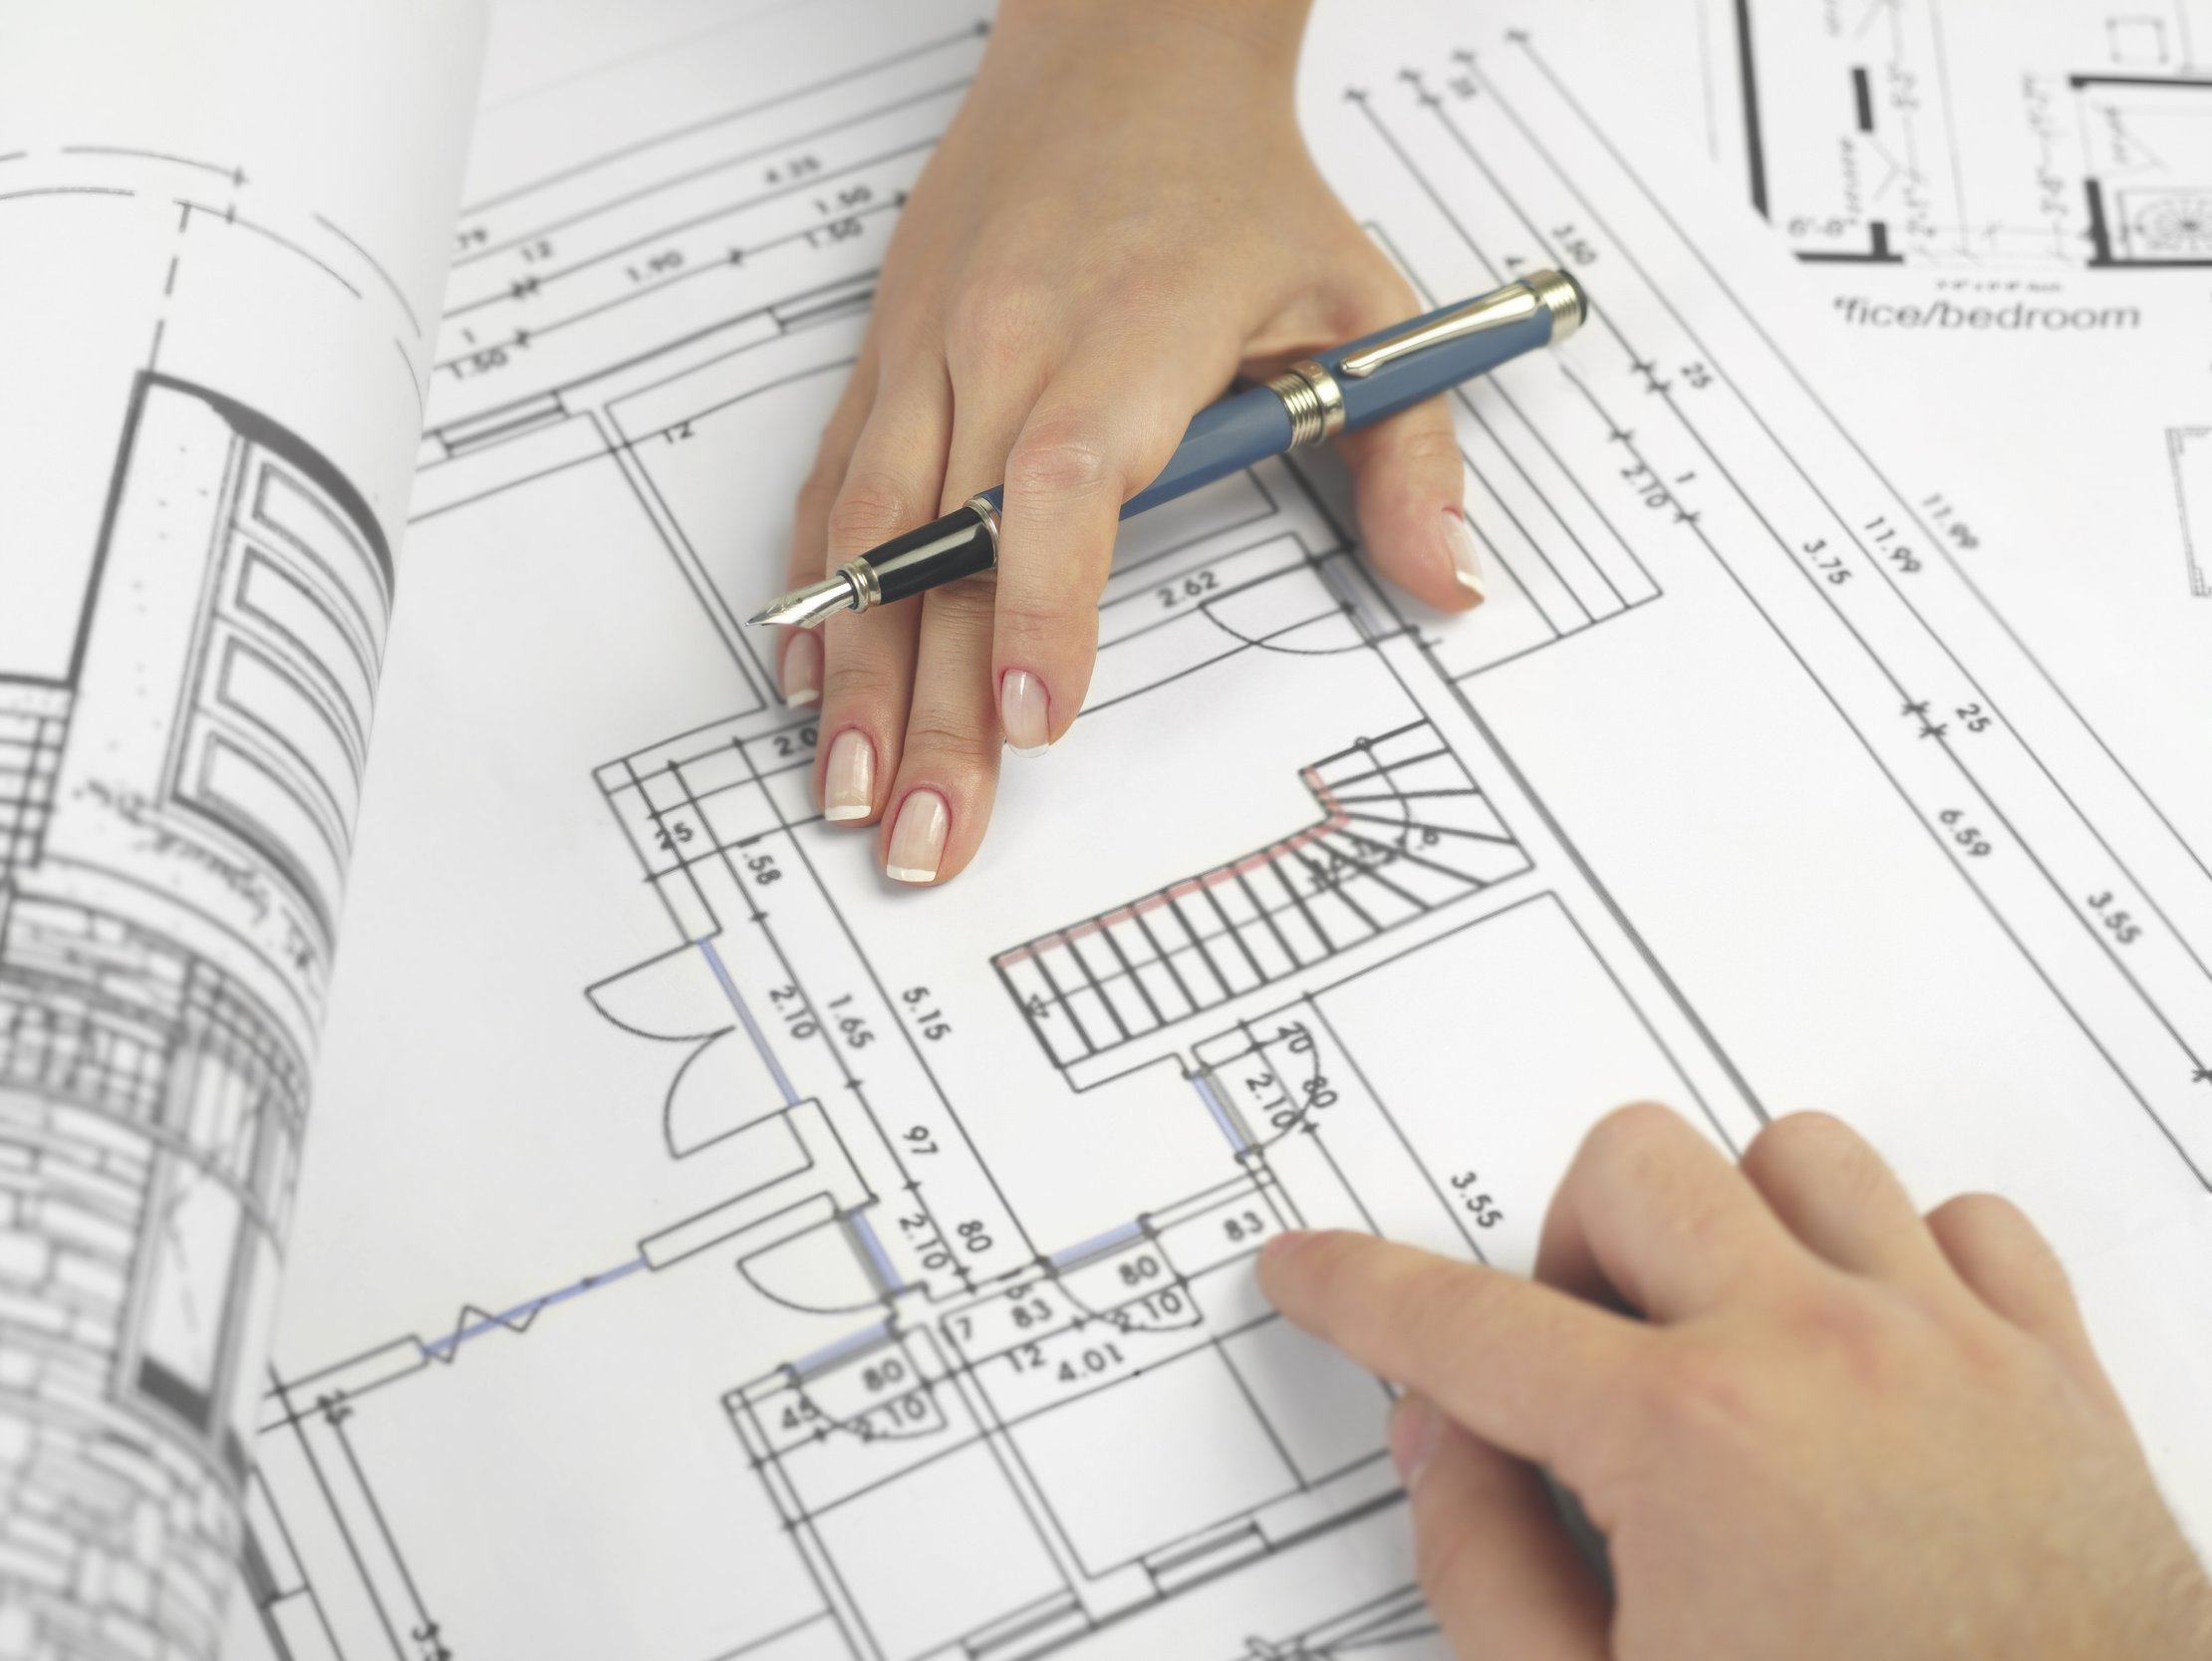 Architecture Design Wallpaper Construction Work Building Job